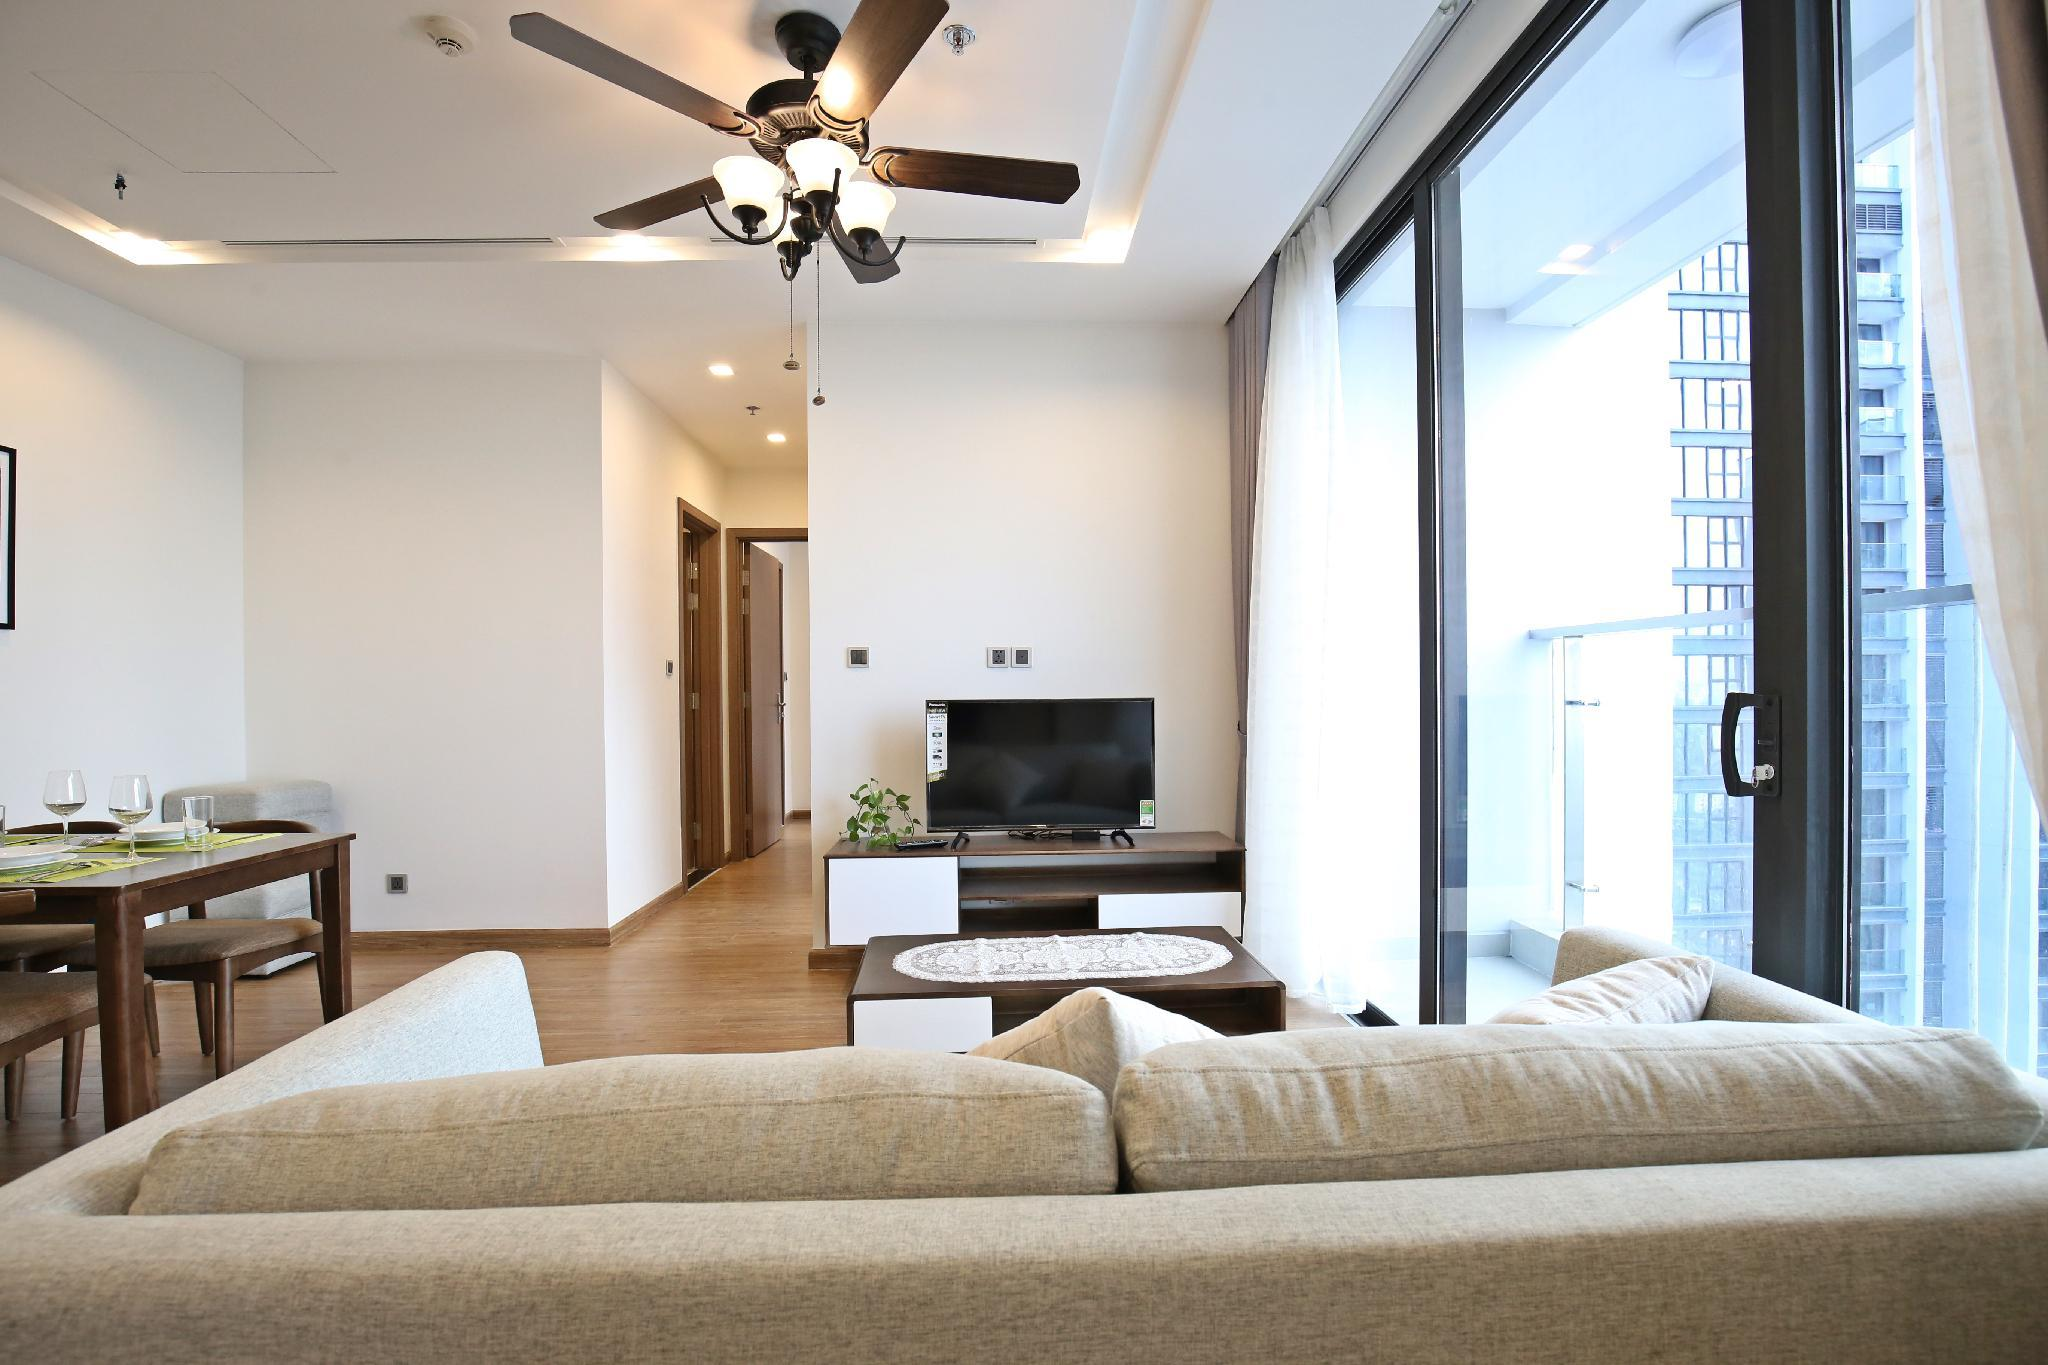 Deluxe Two Bedroom Apartment Hanoi   CityHomes